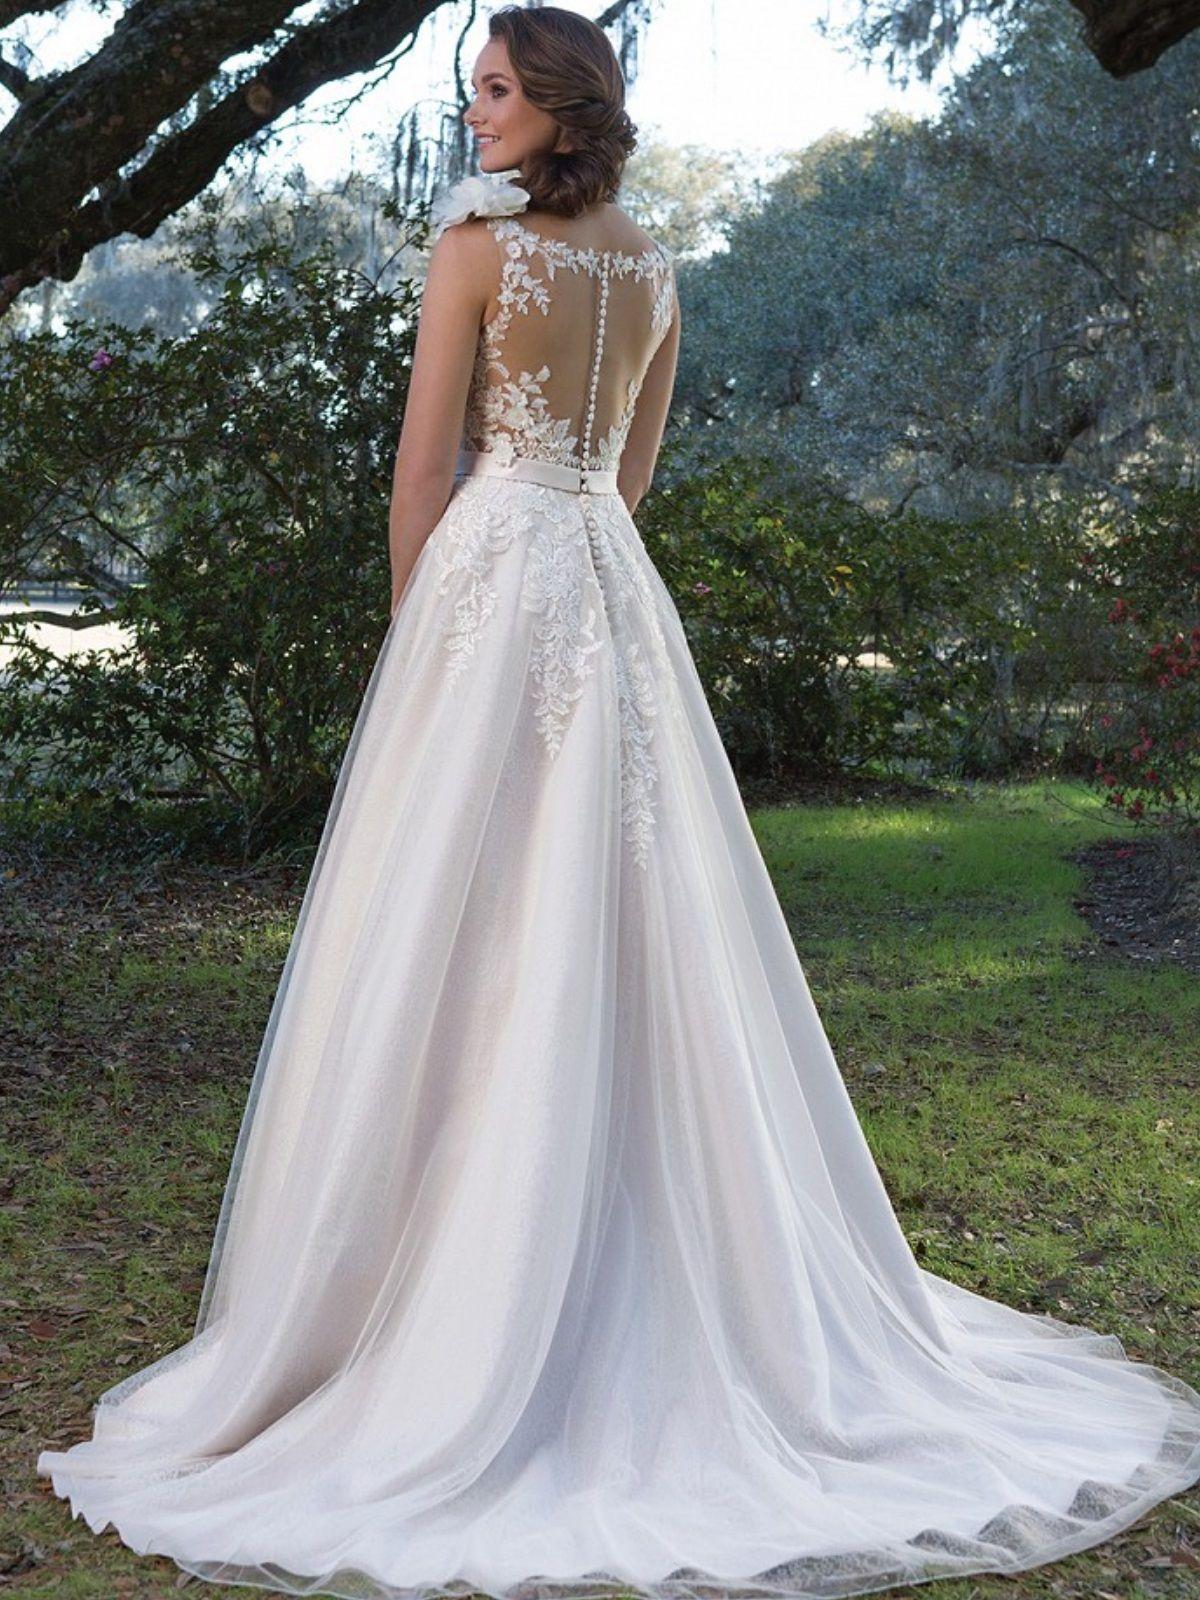 cg wedding dresses pinterest pretoria wedding dress